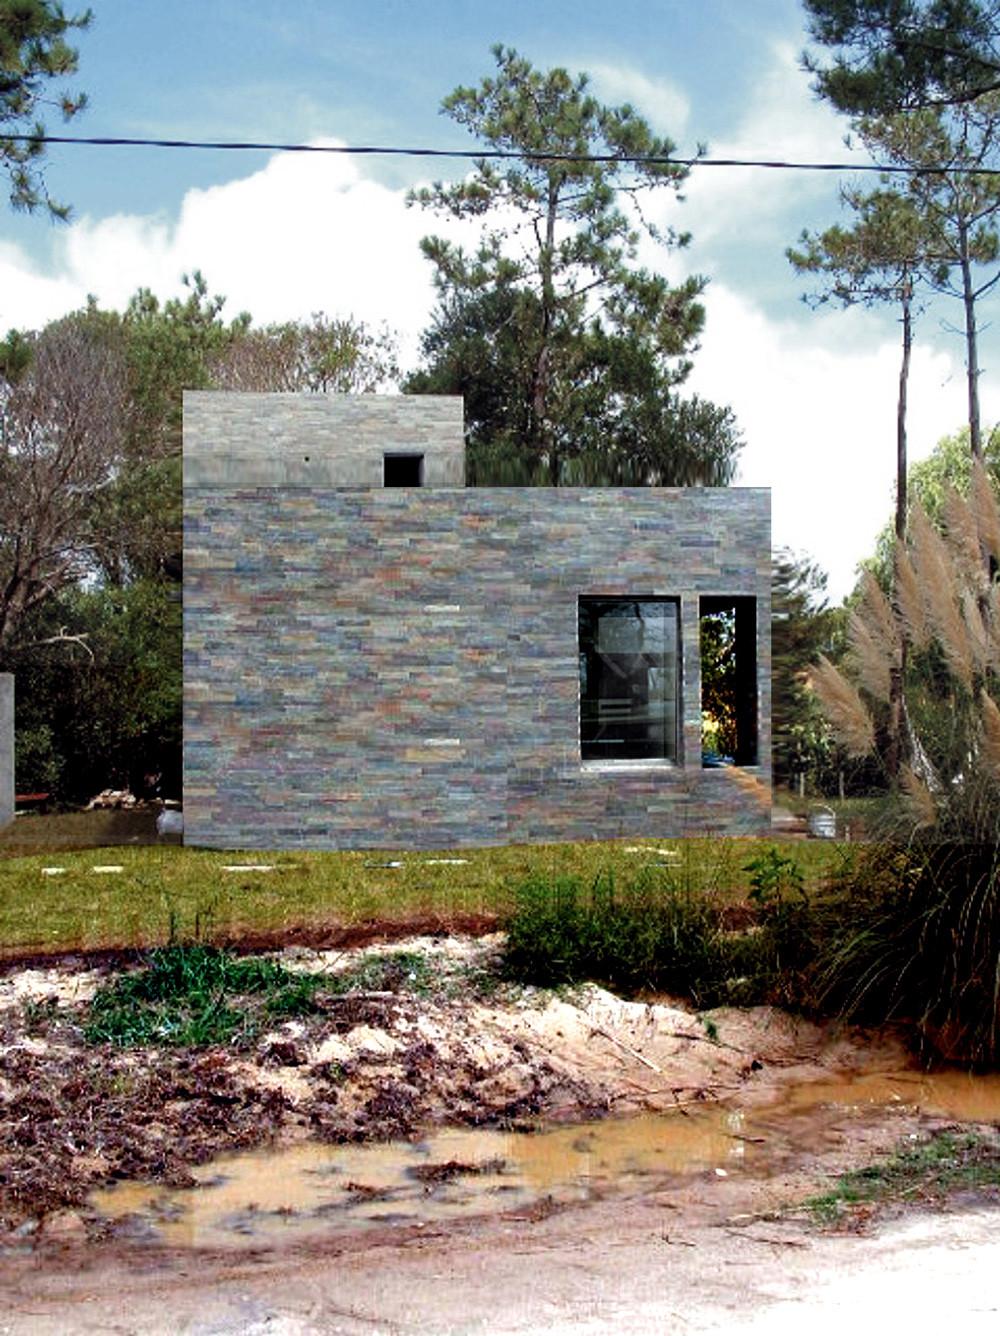 Casa La Pedrera / MBAD Arquitectos, © MBAD